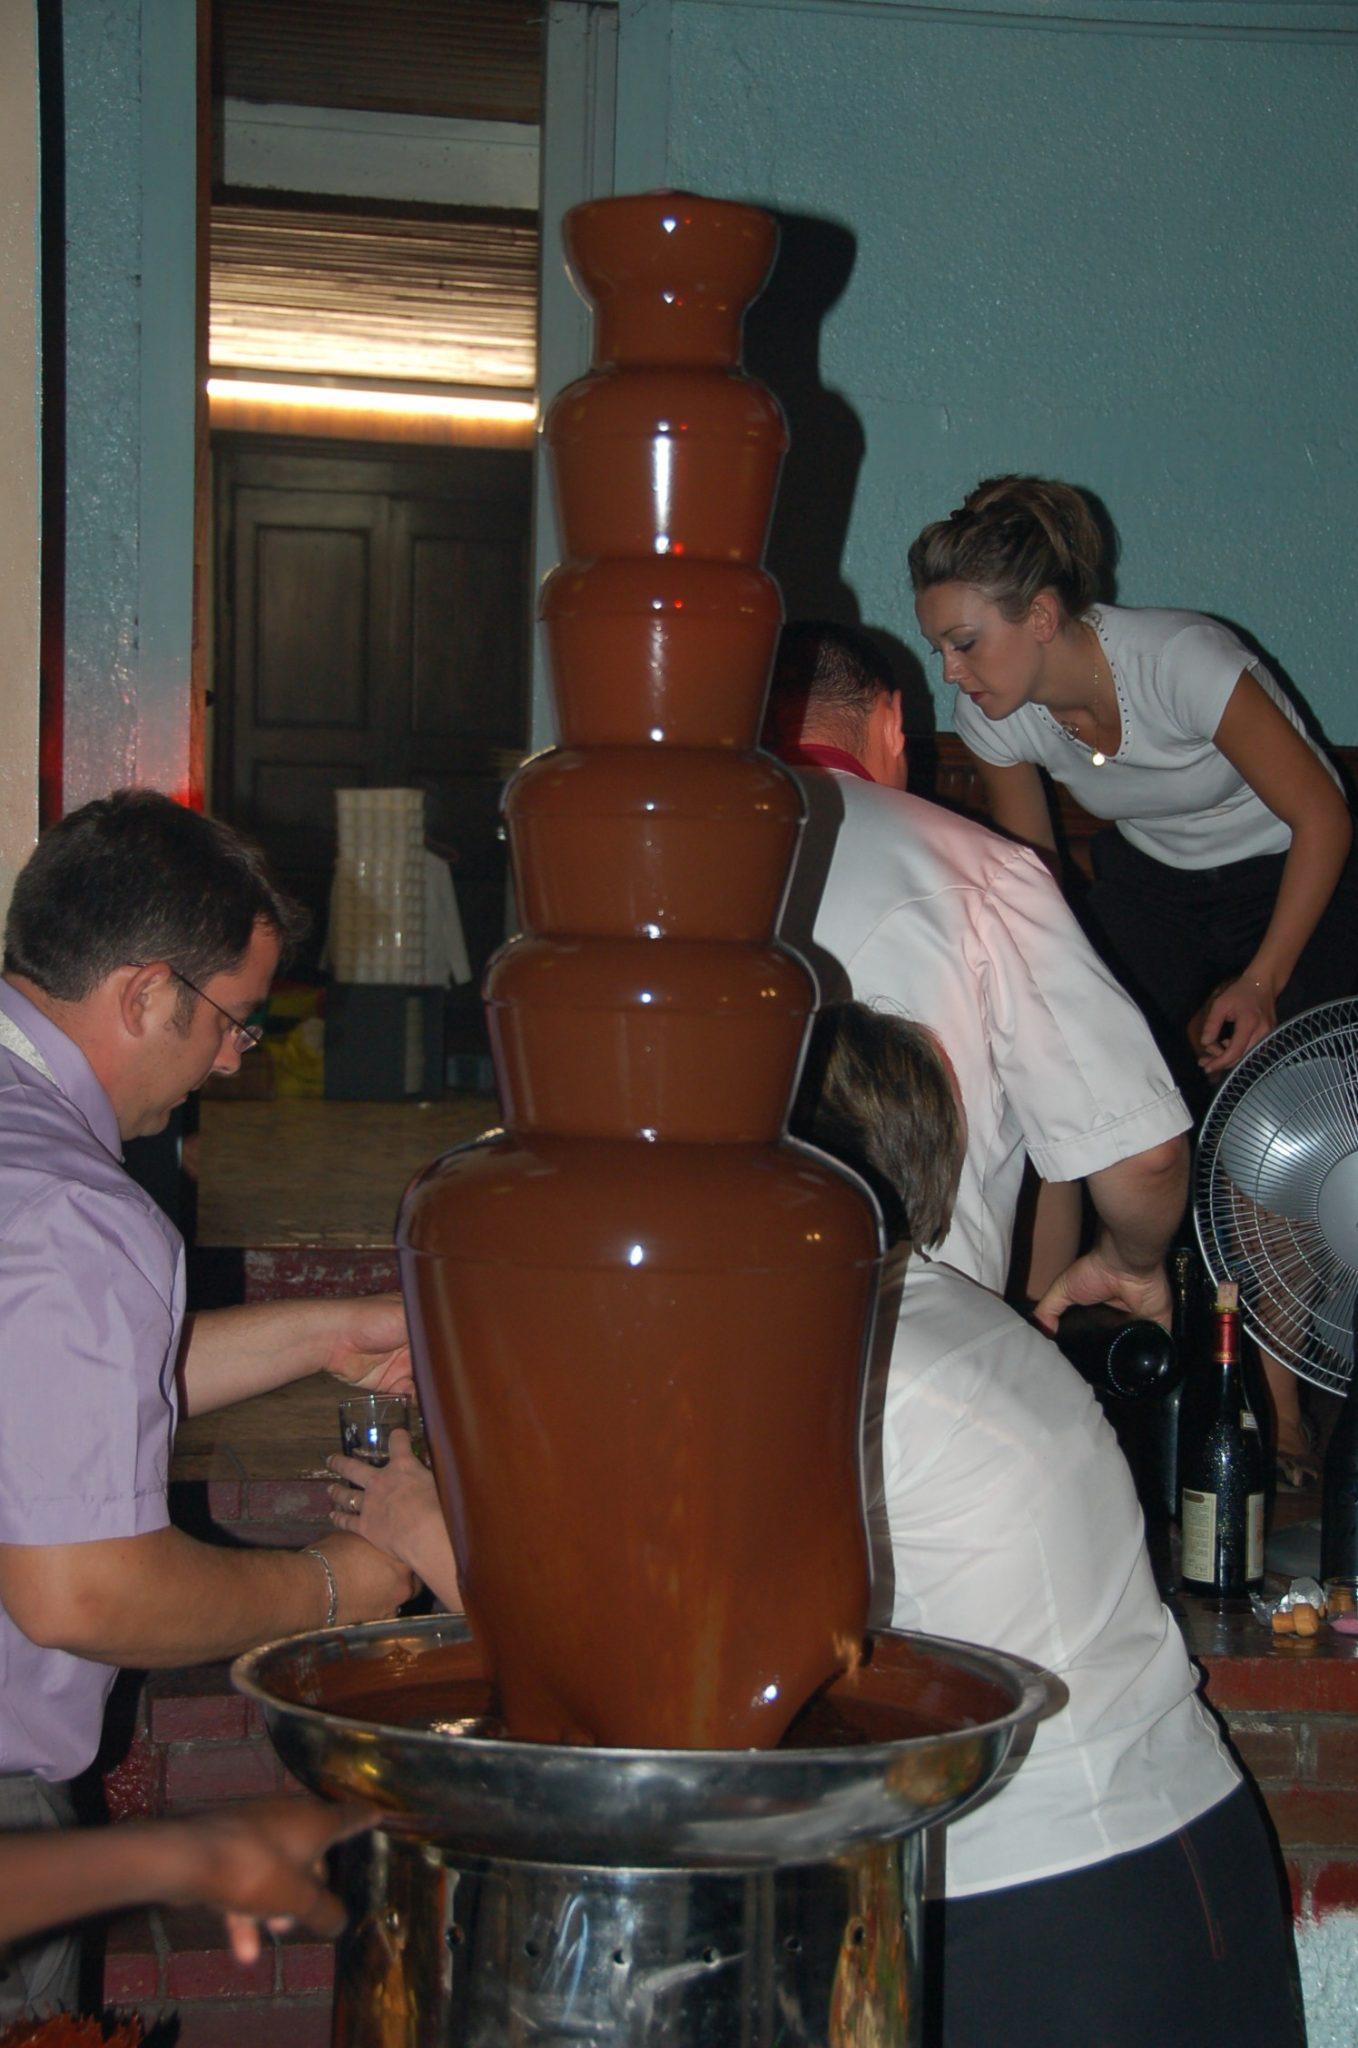 Louer fontaine chocolat lyon